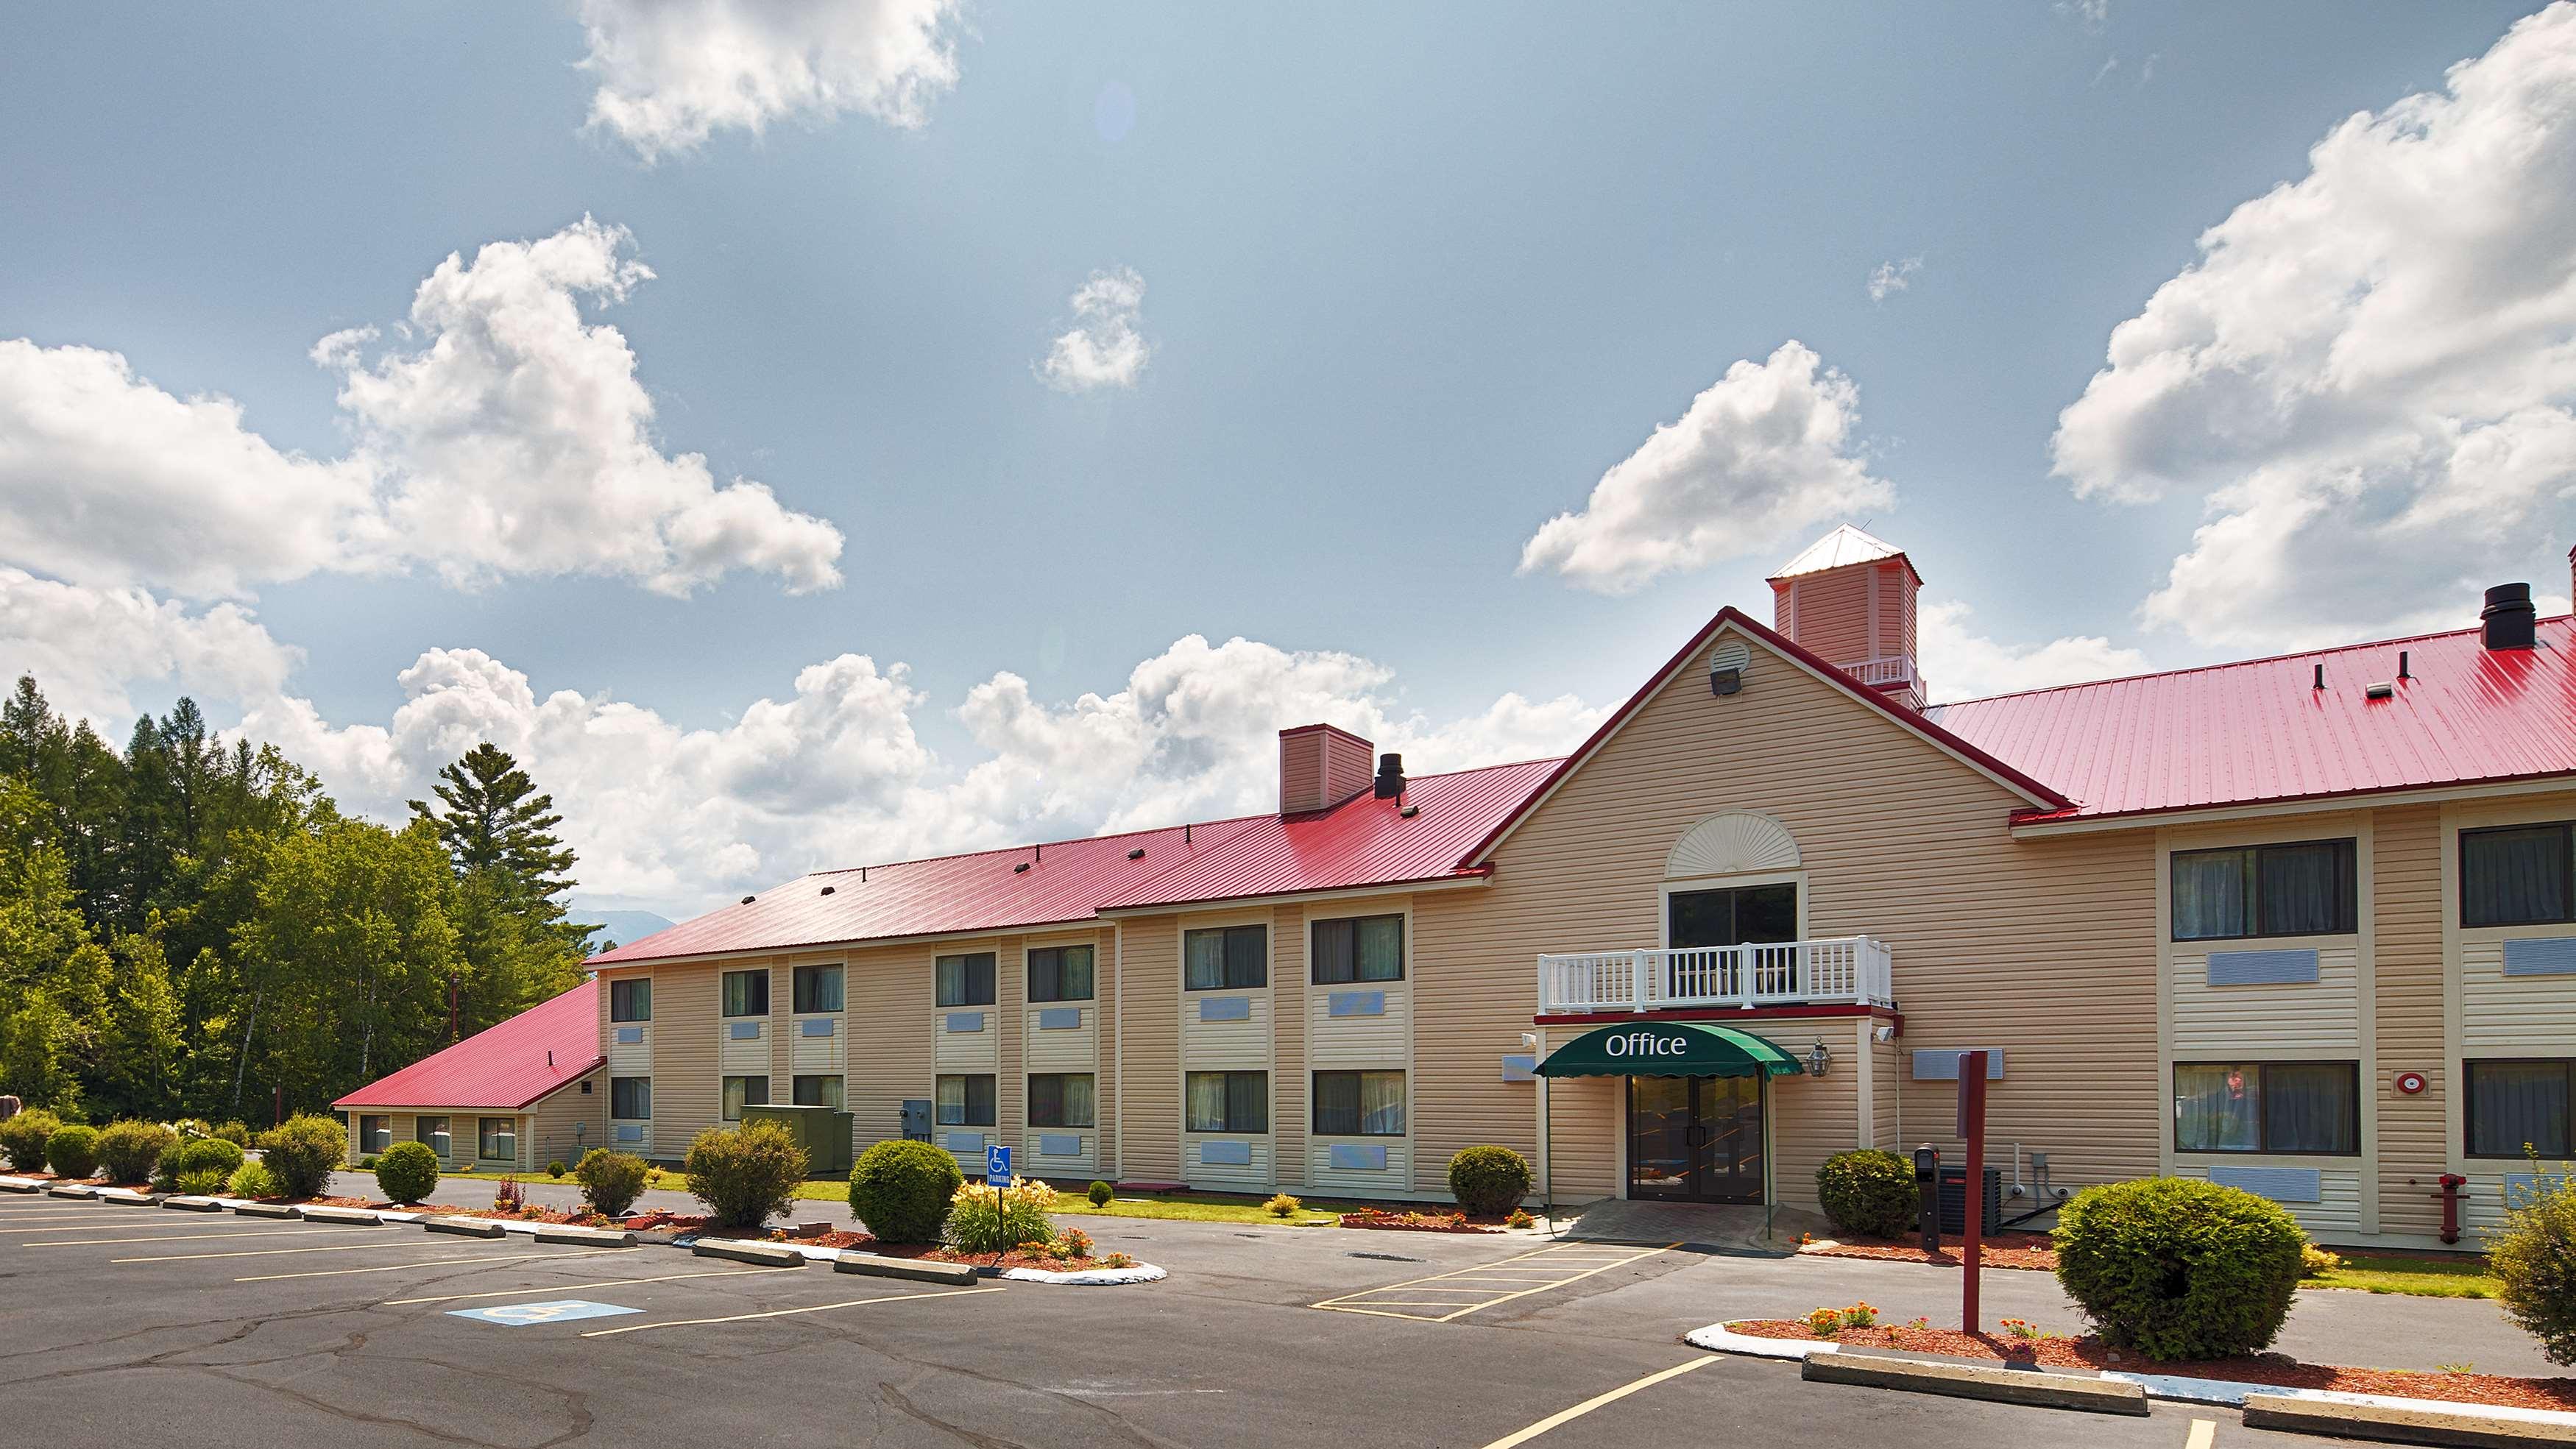 Best Western White Mountain Inn image 0